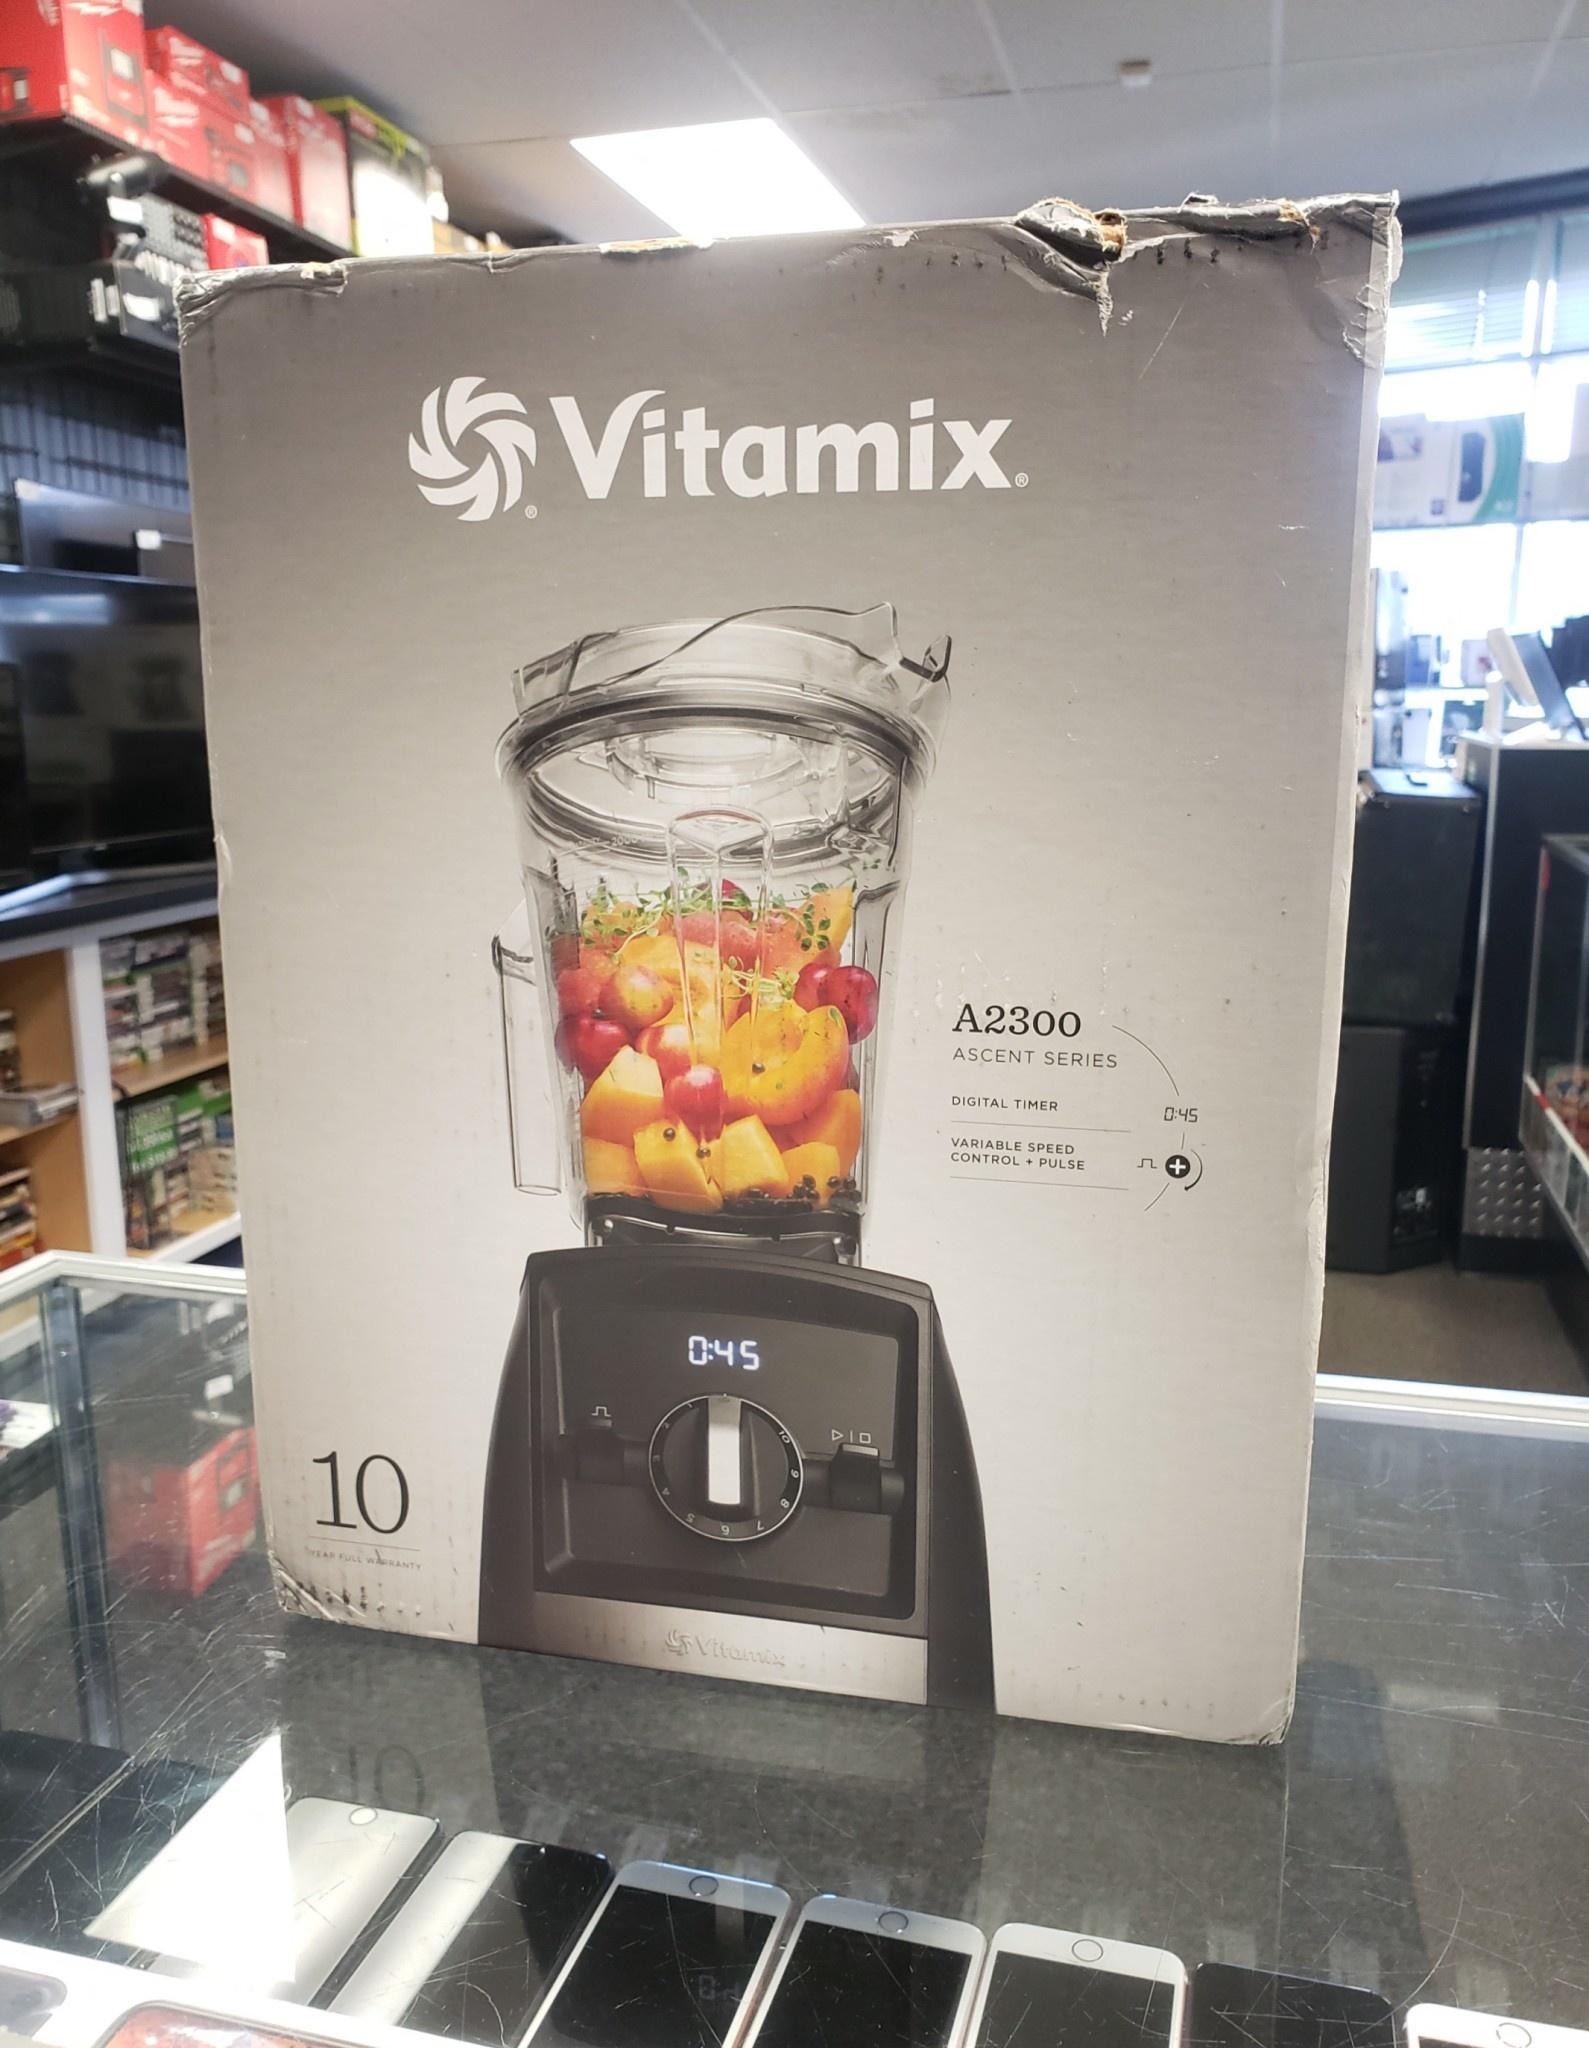 Vitamix A2300 Ascent Series 64oz. Smart Professional Blender - new Open Box